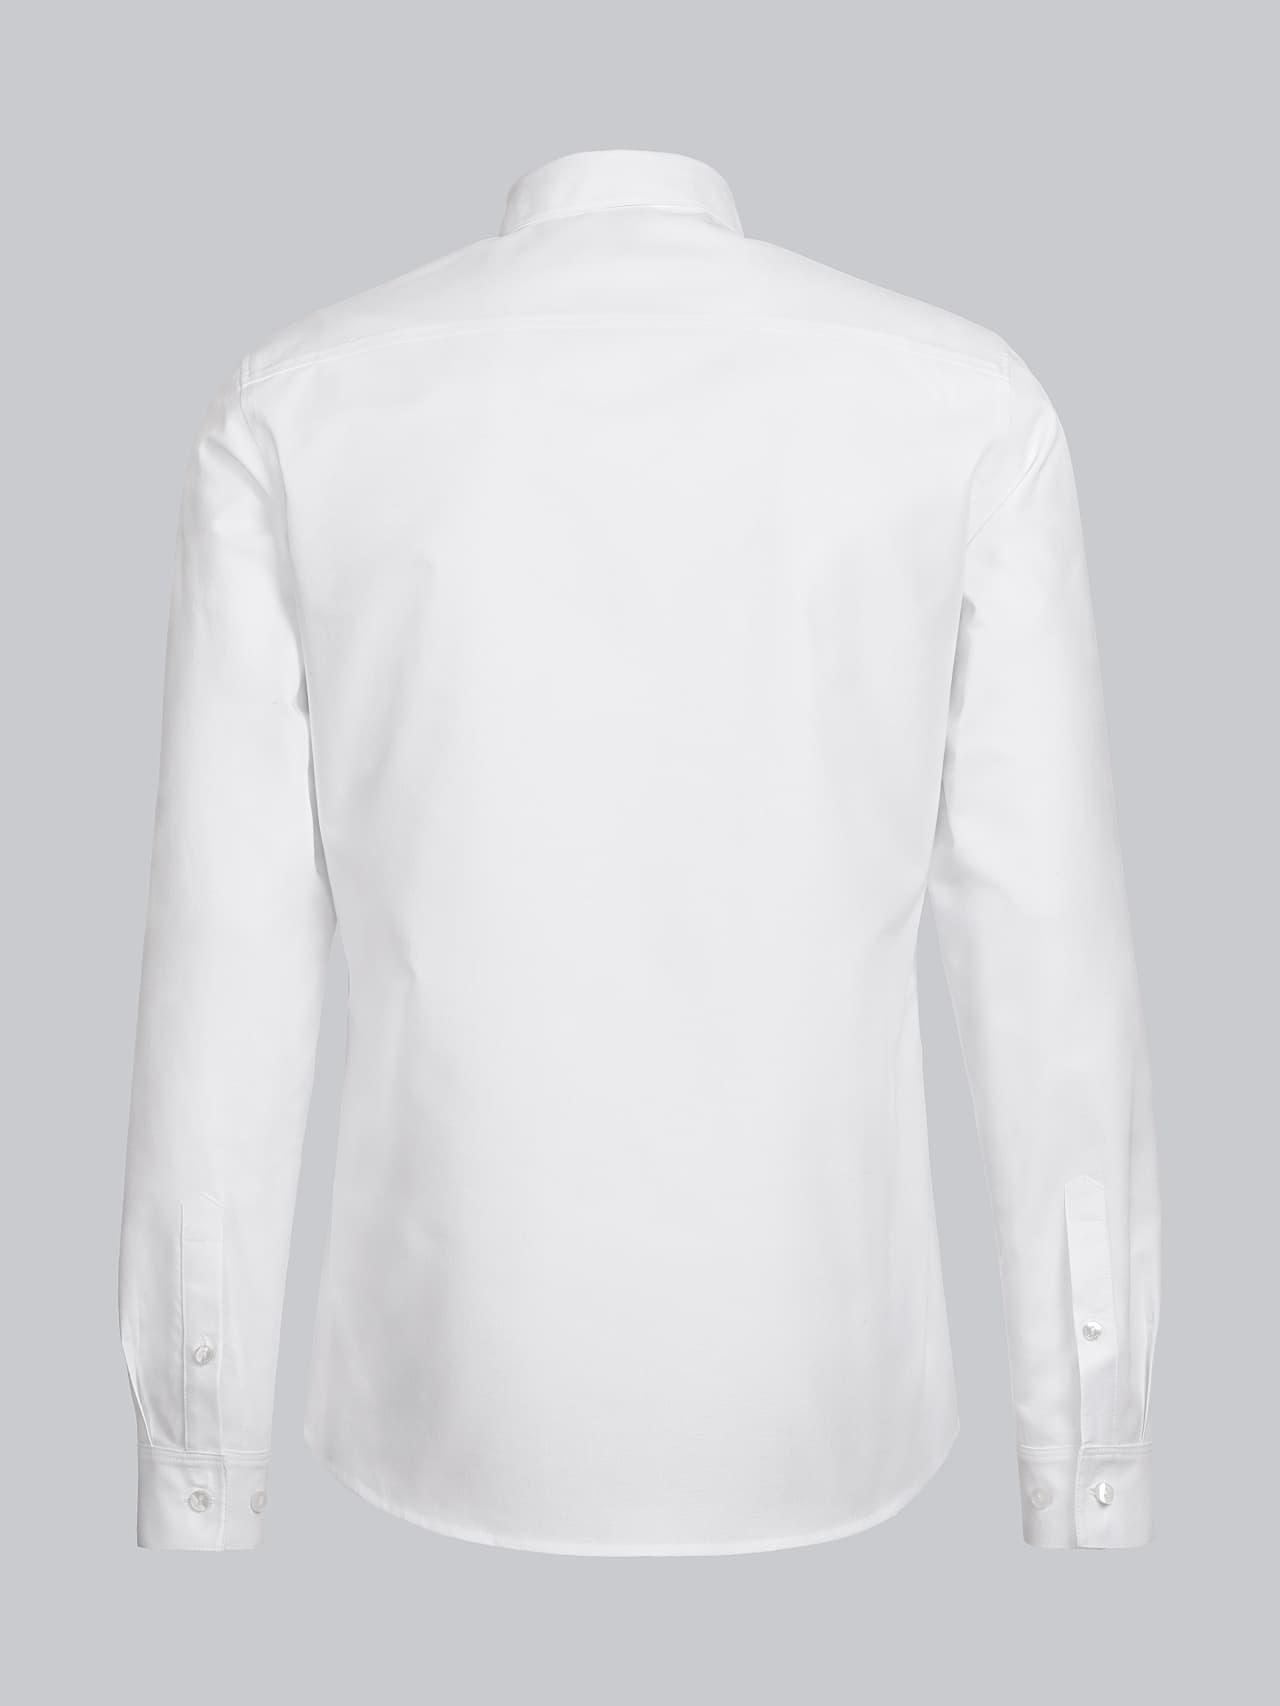 WOSKA V2.Y5.01 Kent Collar Oxford Shirt white Left Alpha Tauri